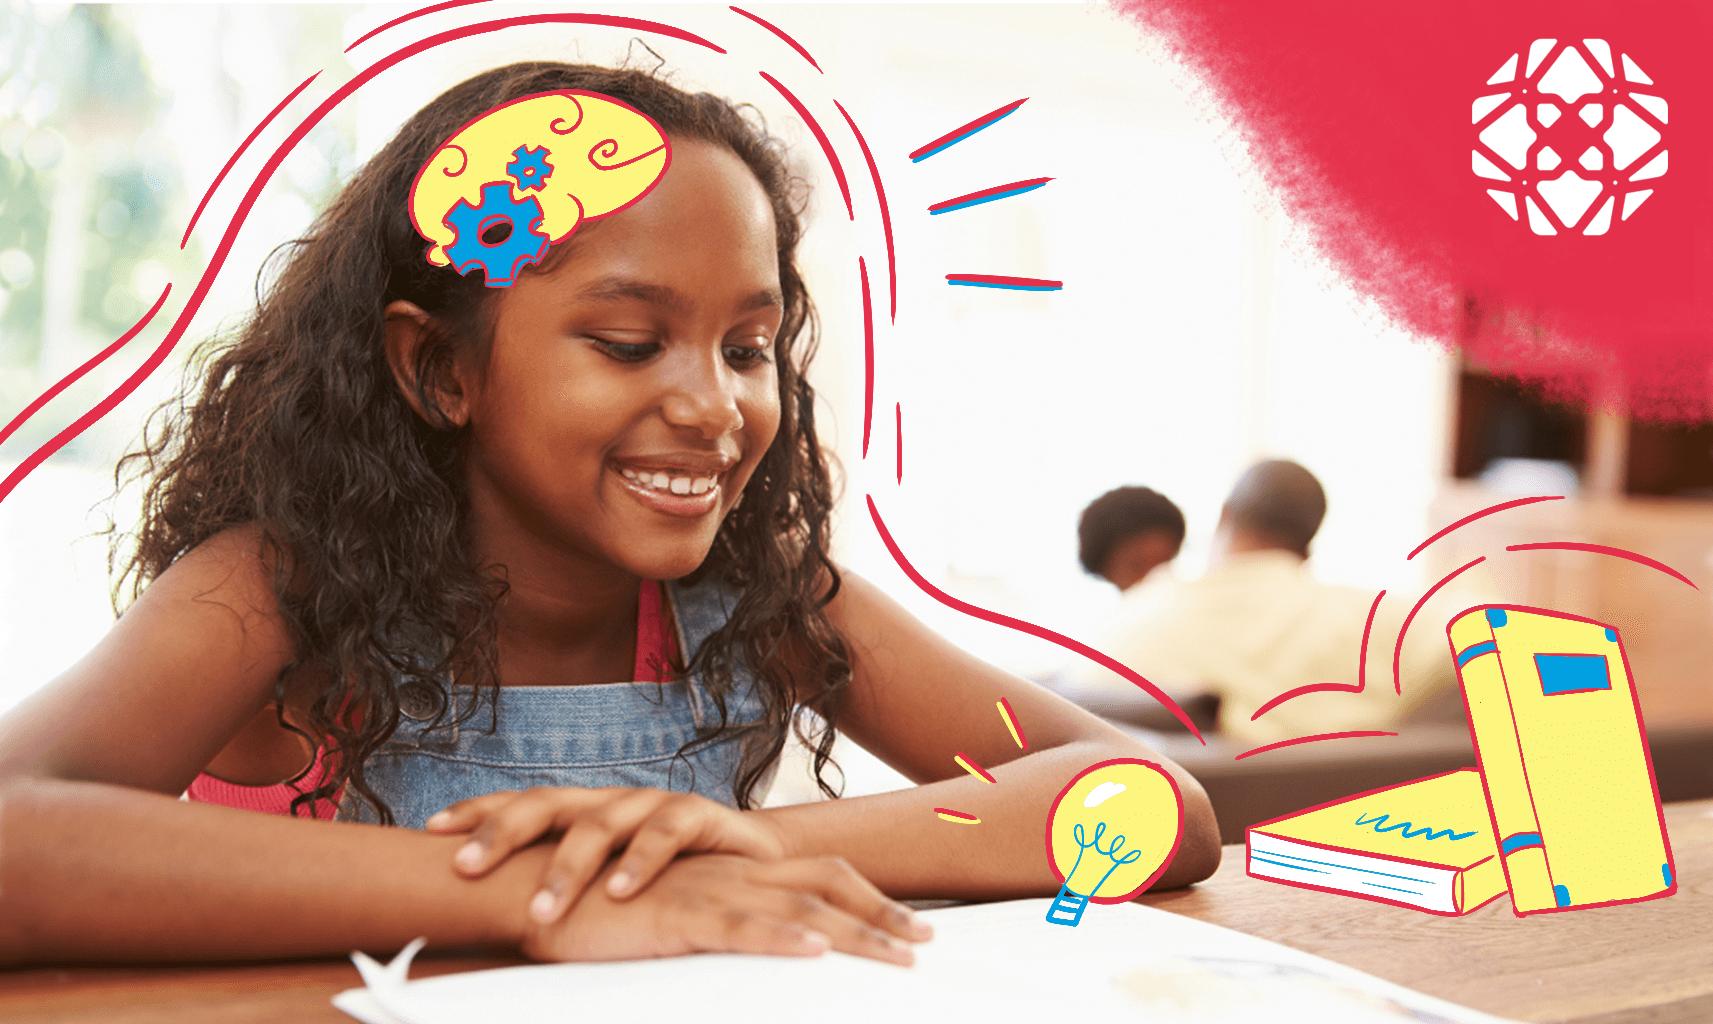 Importância da Leitura desenvolvimento infantil cérebro Truth and Tales